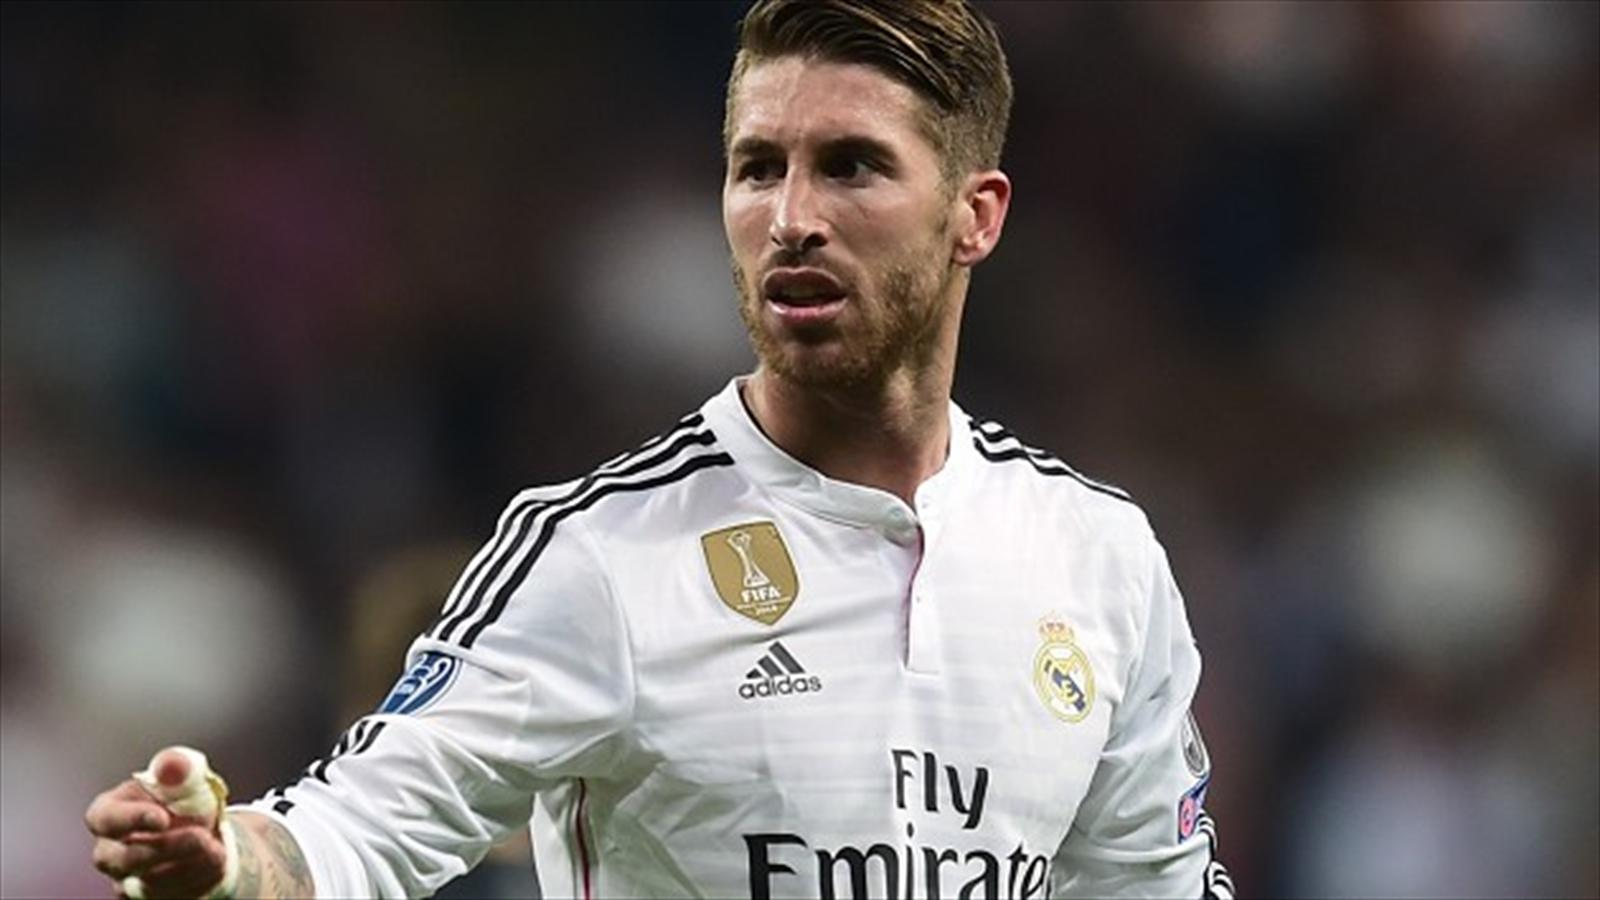 Spain international Sergio Ramos joined Real Madrid in 2005